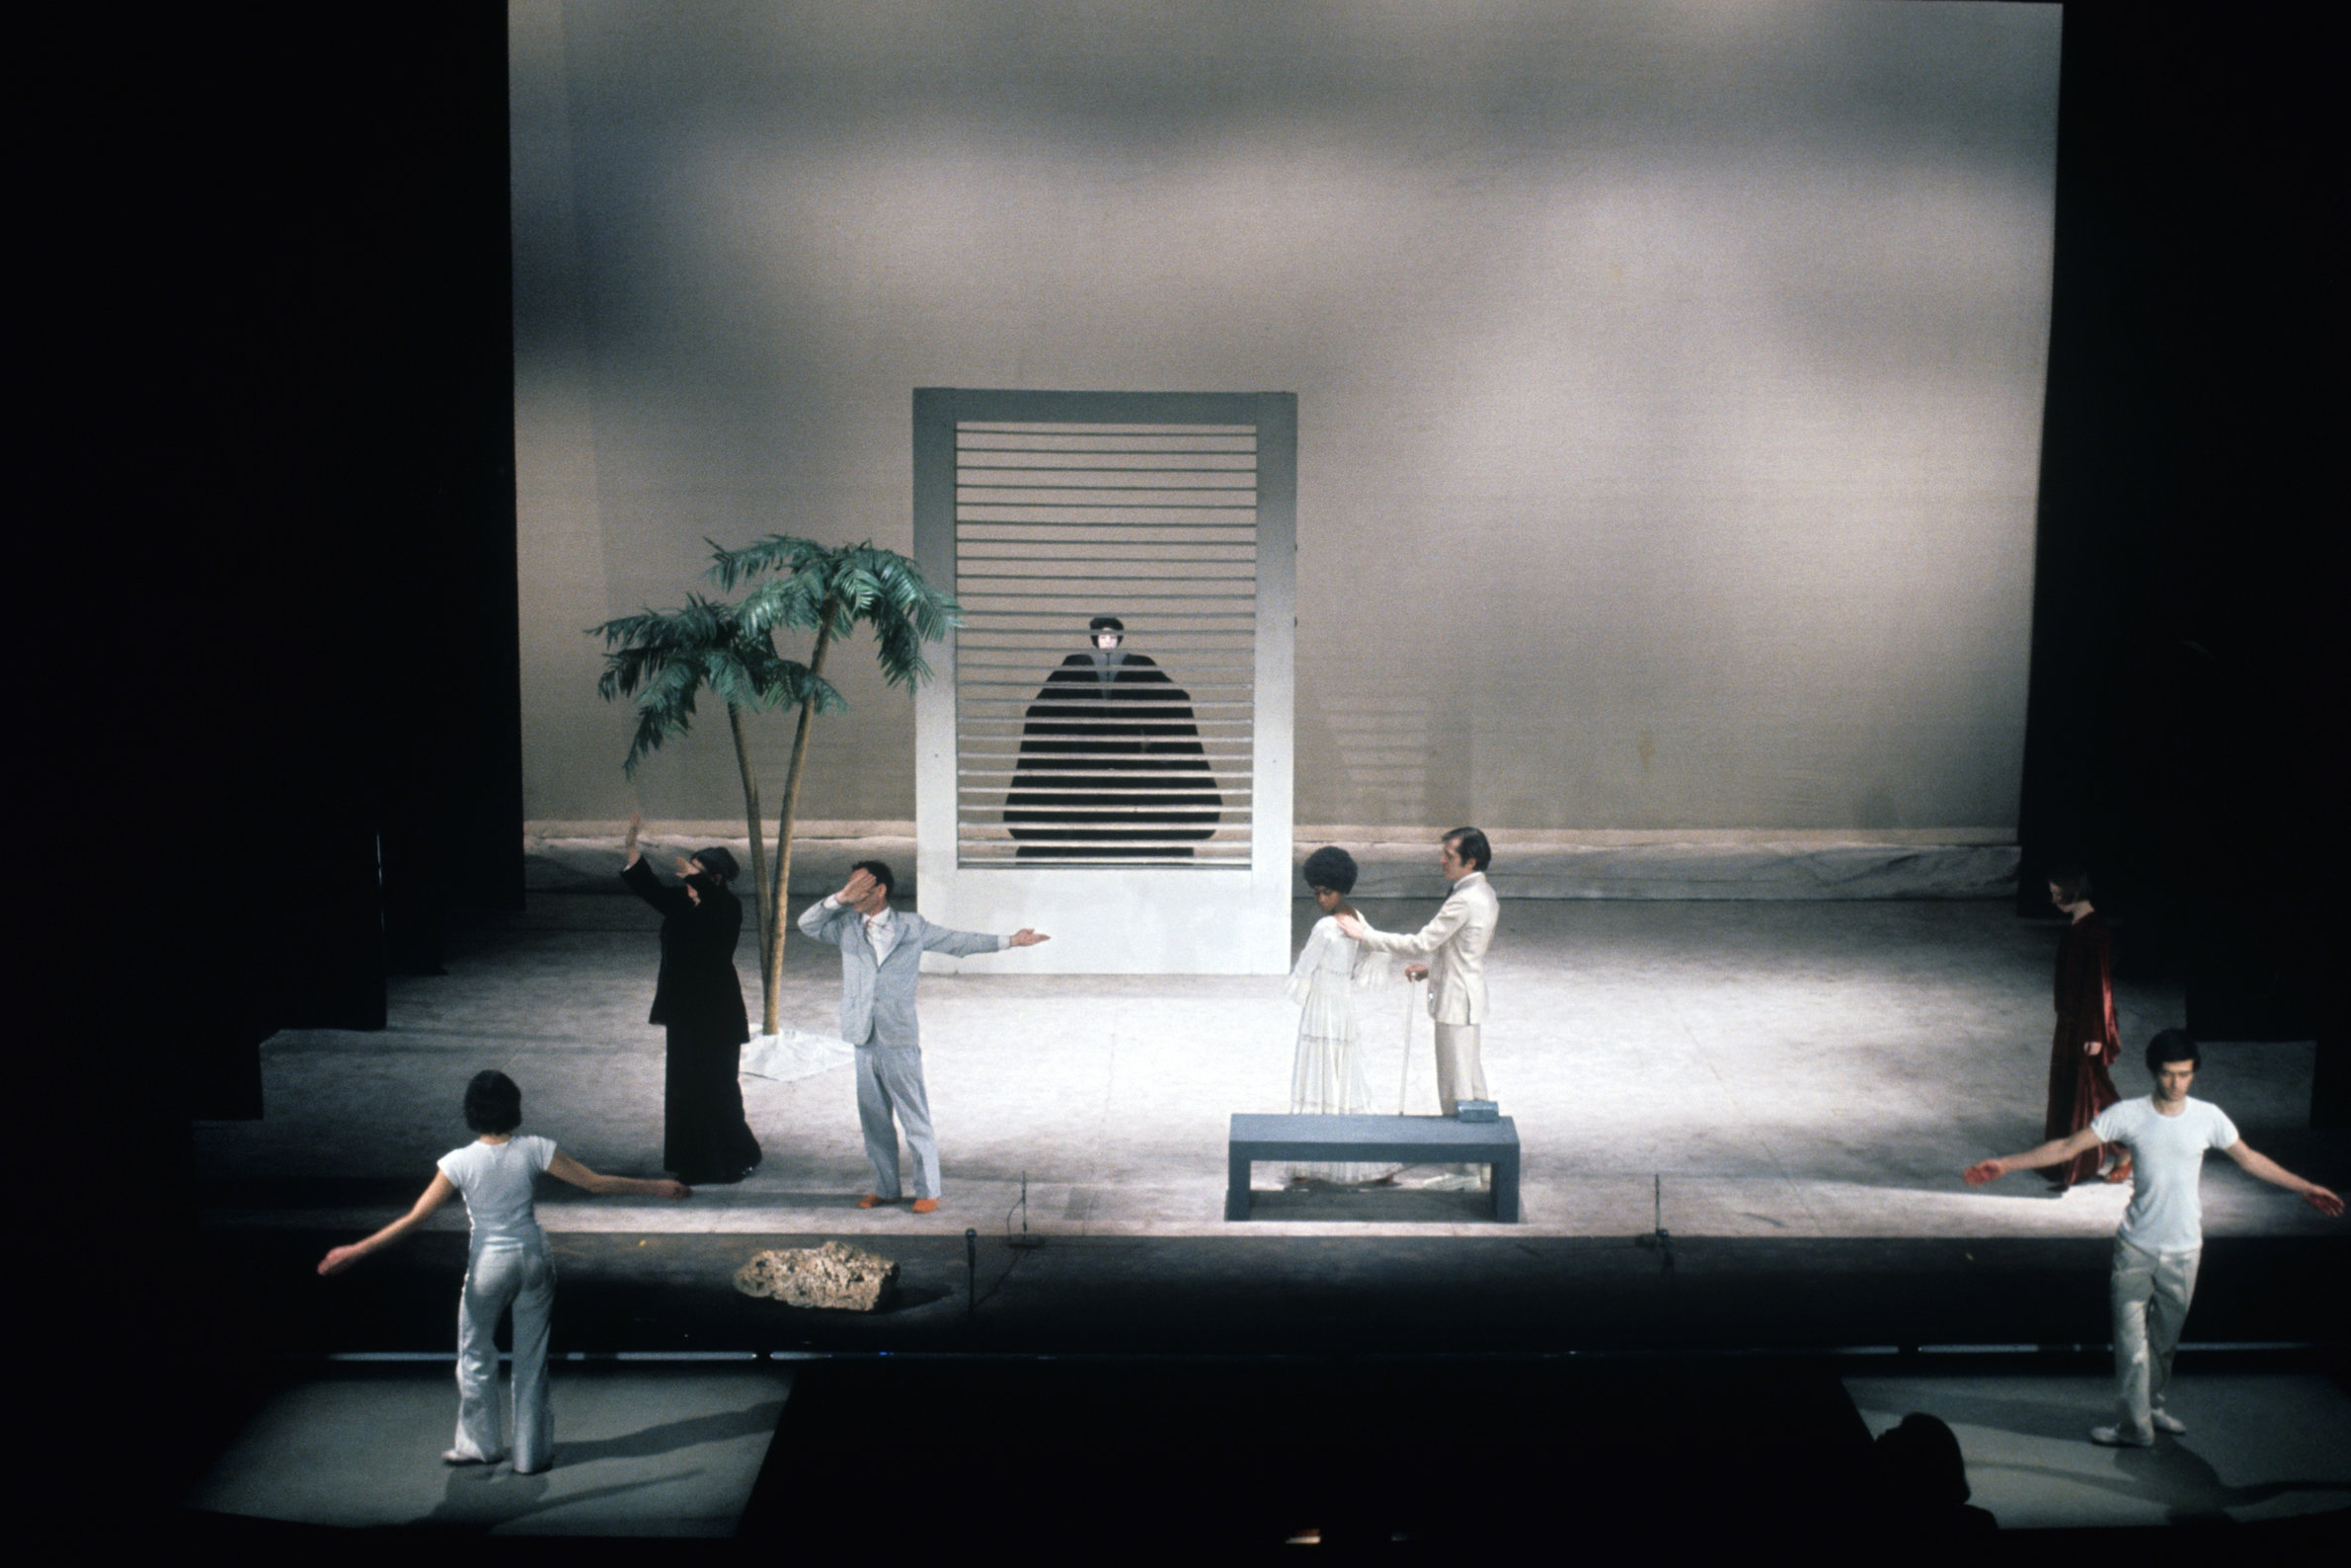 Act 4, Section 1: Ensemble